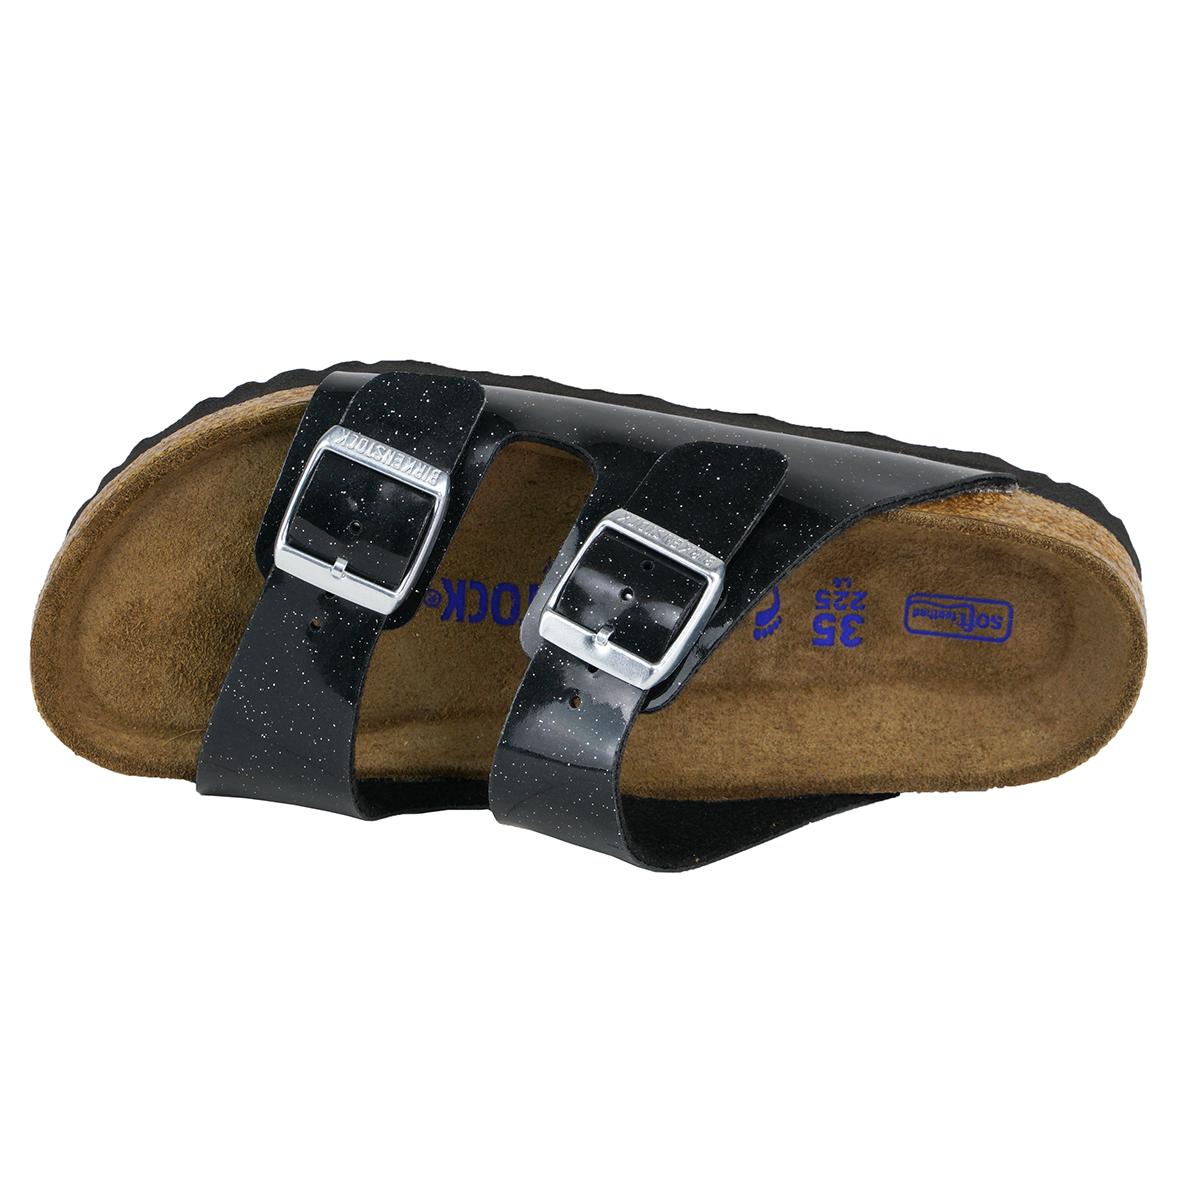 09e532f1bad0 Birkenstock Arizona Soft Footbed Birko-Flor Sandals Magic Galaxy Black 35